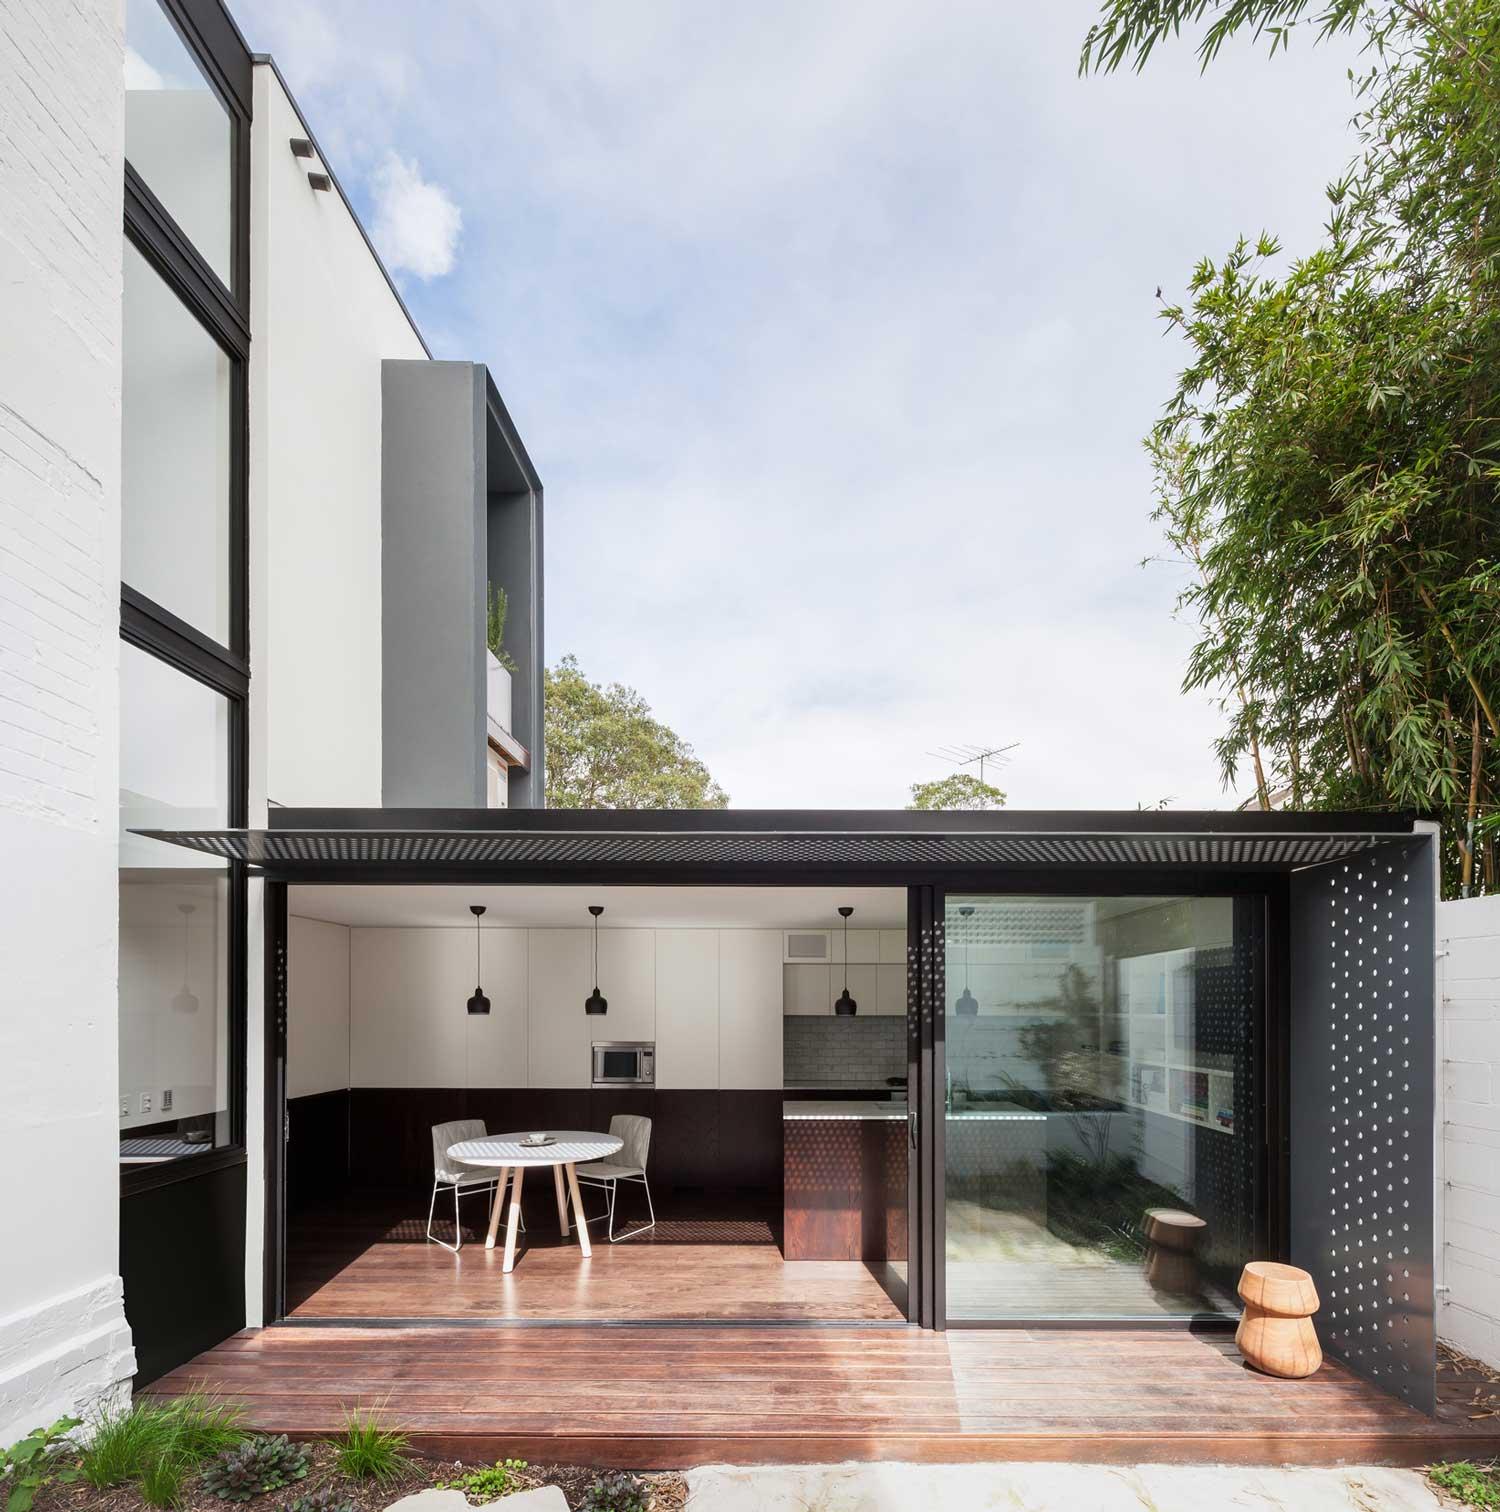 House McBeath by Tribe Studio Architects. Photo by Katherine Lu | Yellowtrace